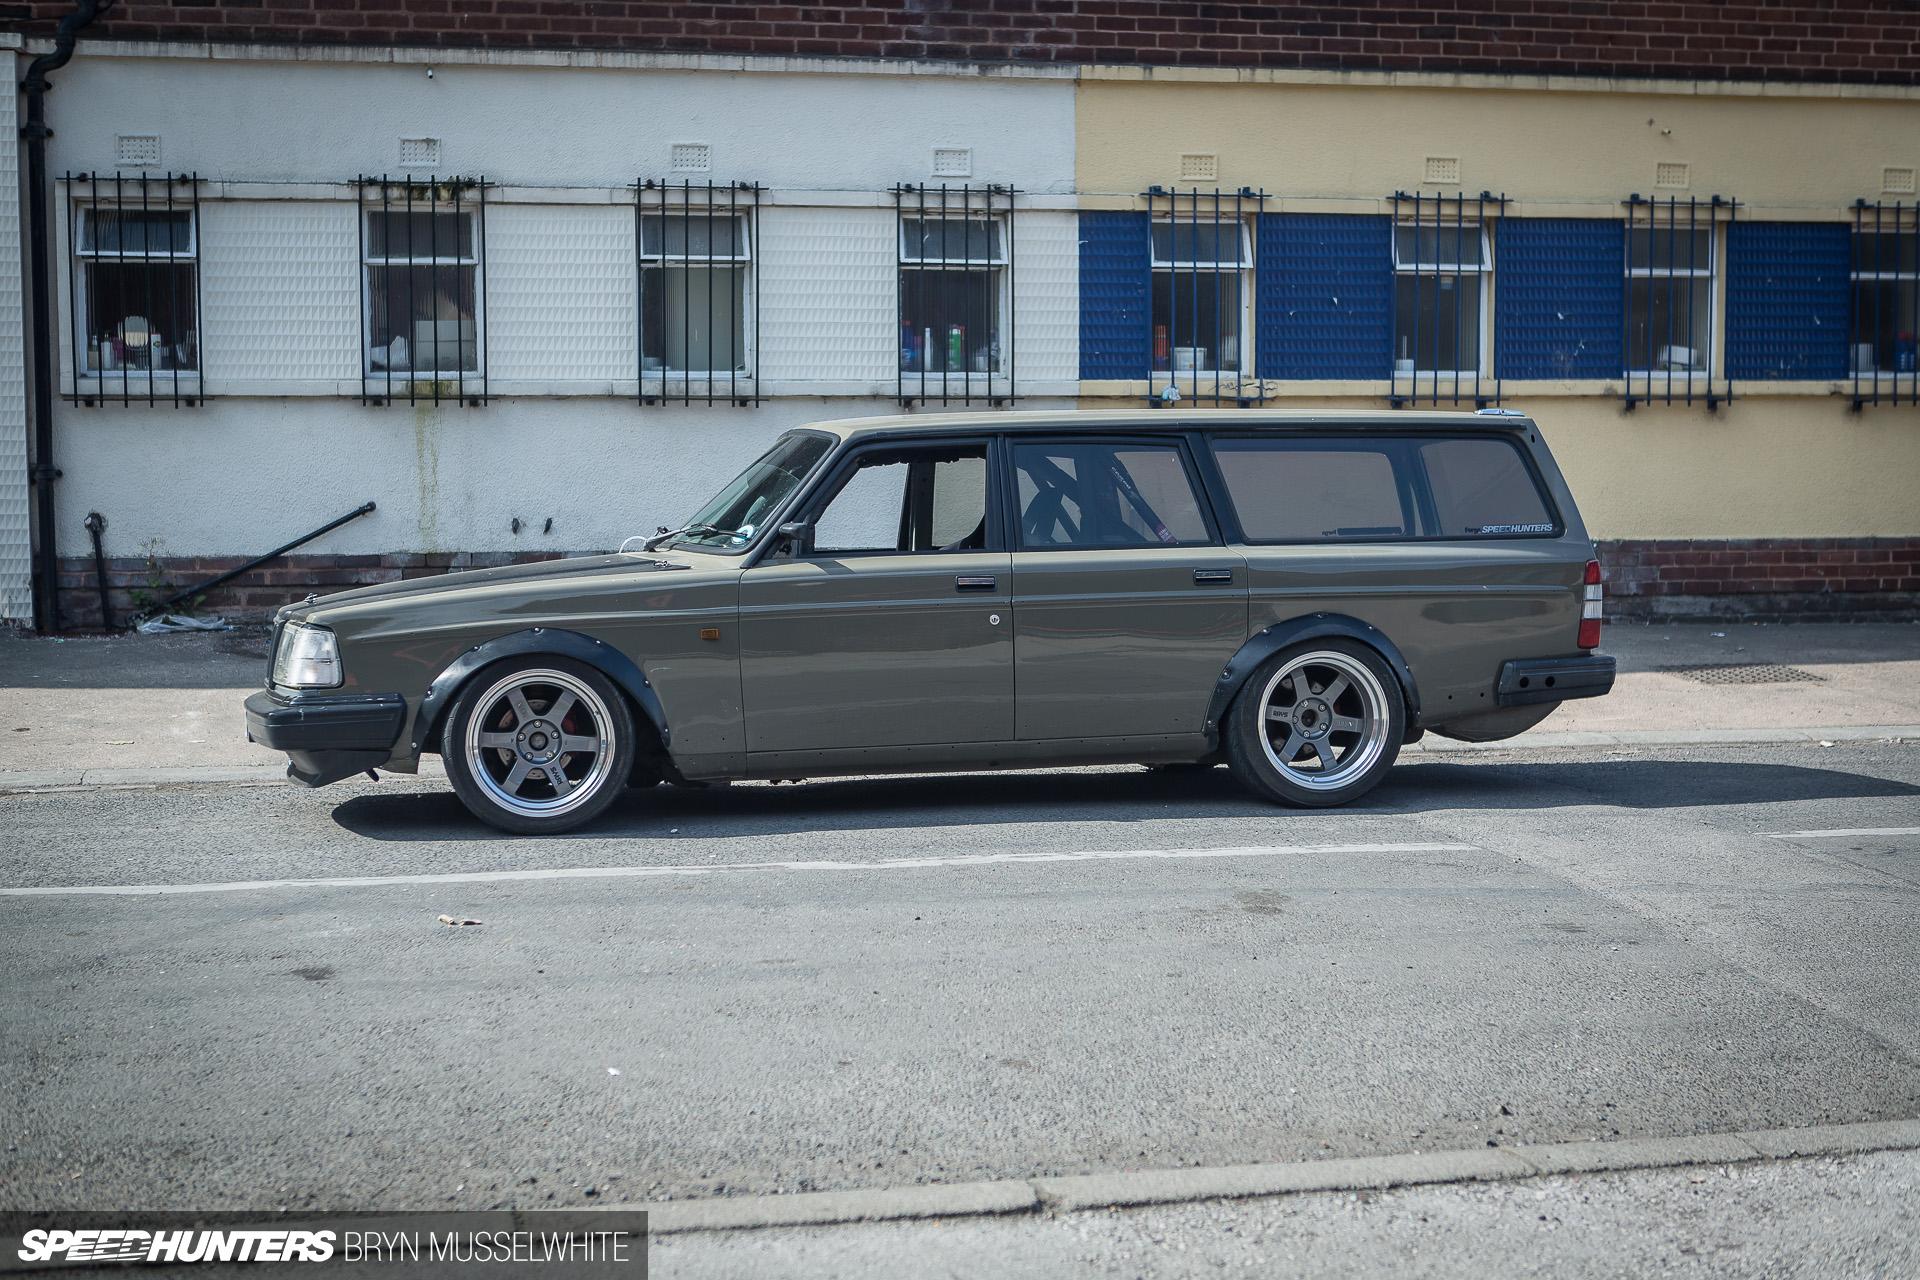 Volvo Turbo Wagon Strip Club Speedhunters Bryn Musselwhite 25 Of